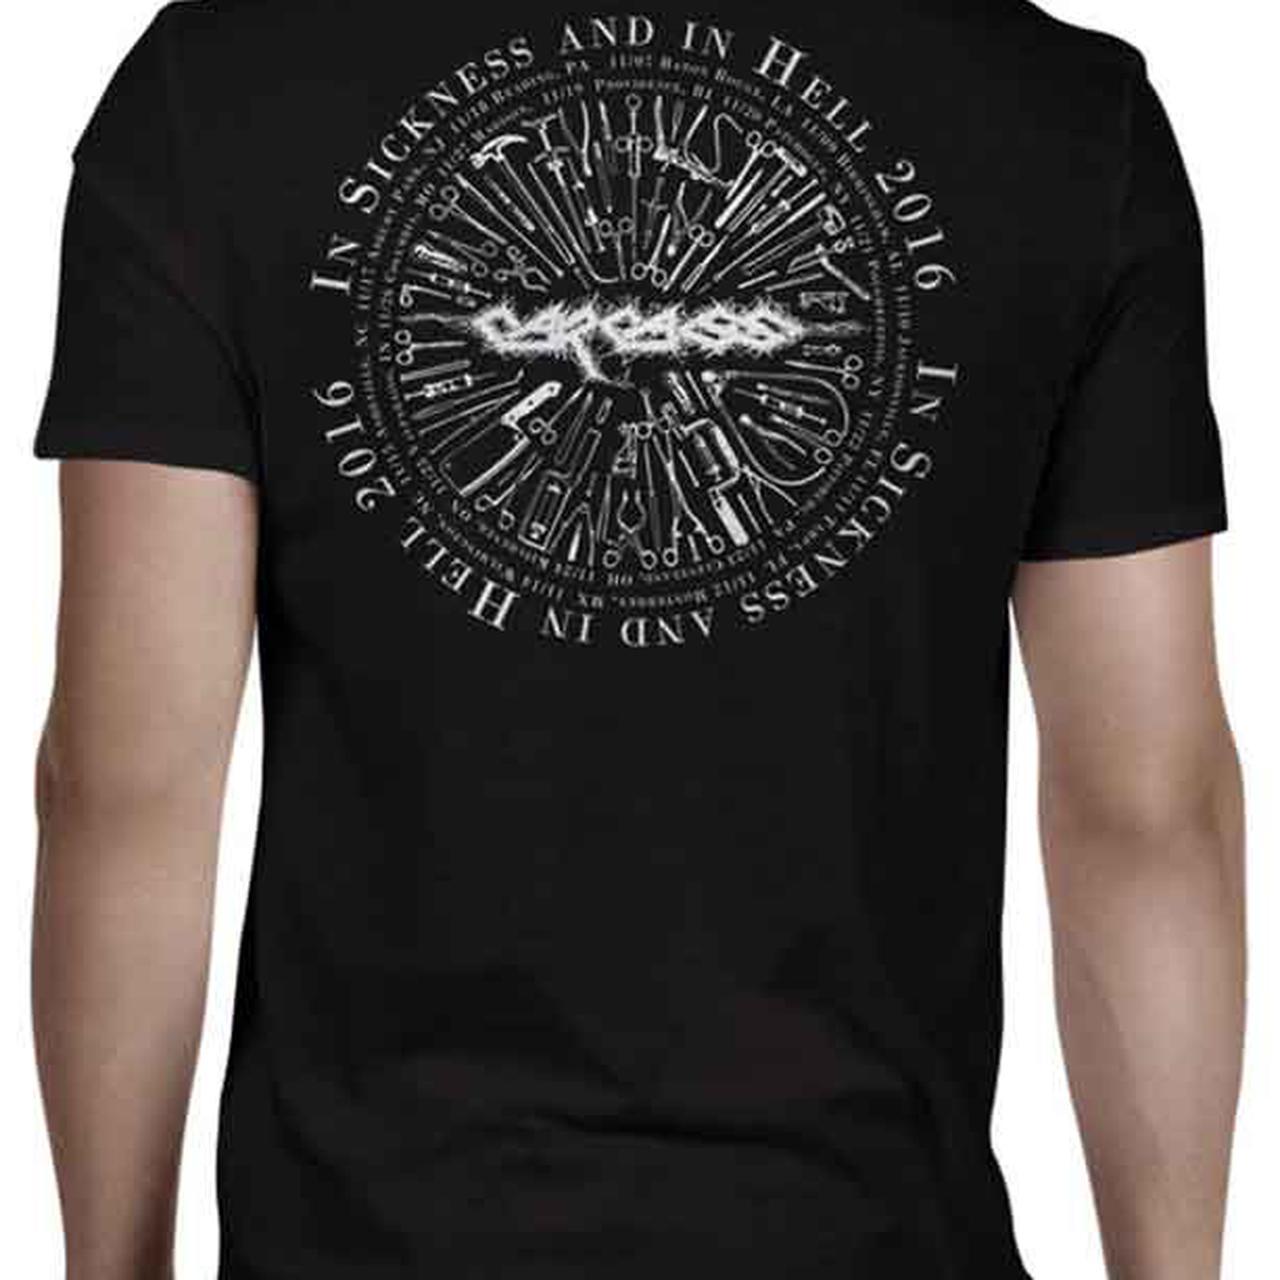 Carcass Anatomy Head Tools 2016 Tour T-Shirt